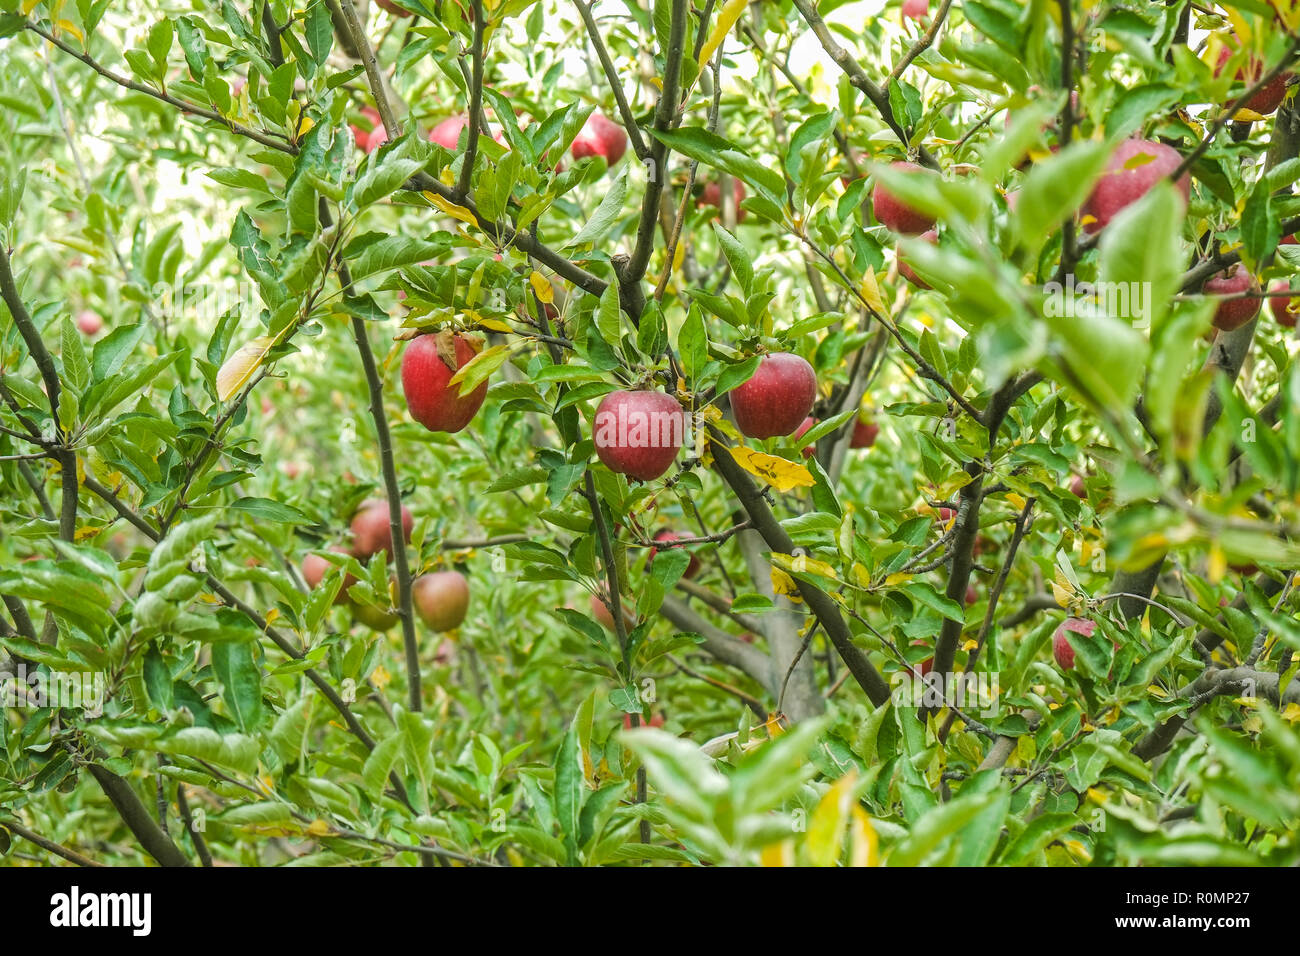 Apple trees in an orchard. Passu village, Gilgit-Baltistan, Pakistan. - Stock Image